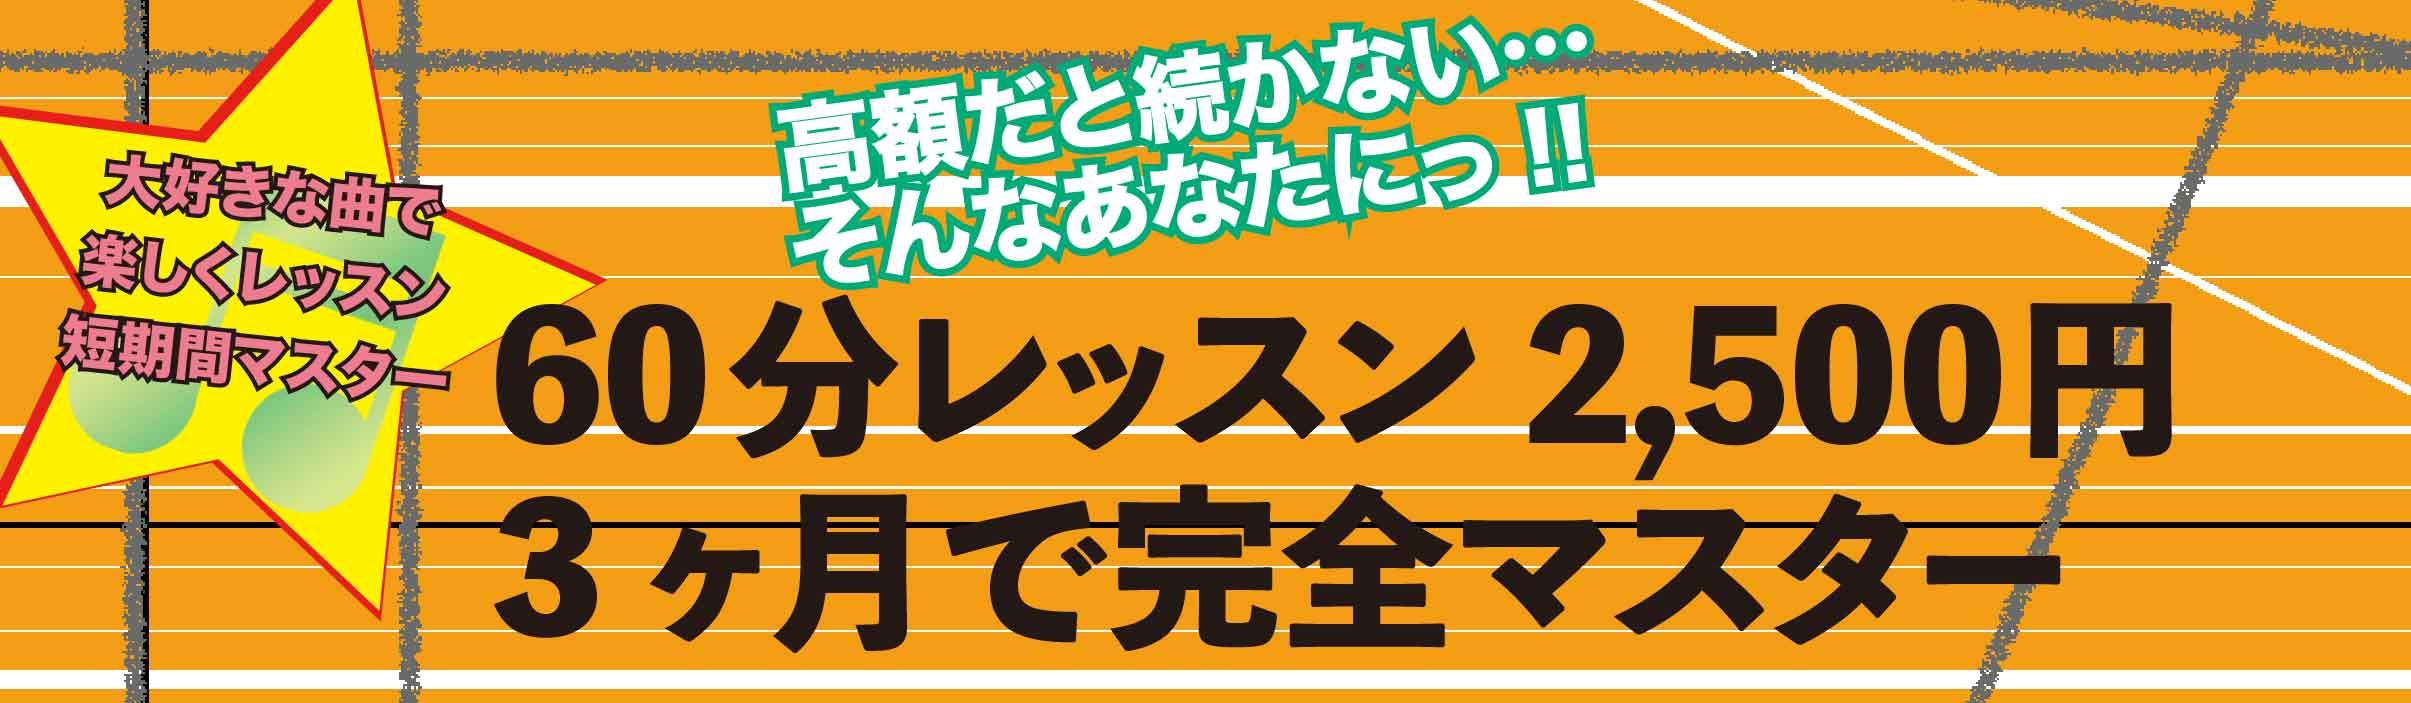 feelベース音楽教室西東京市田無教室